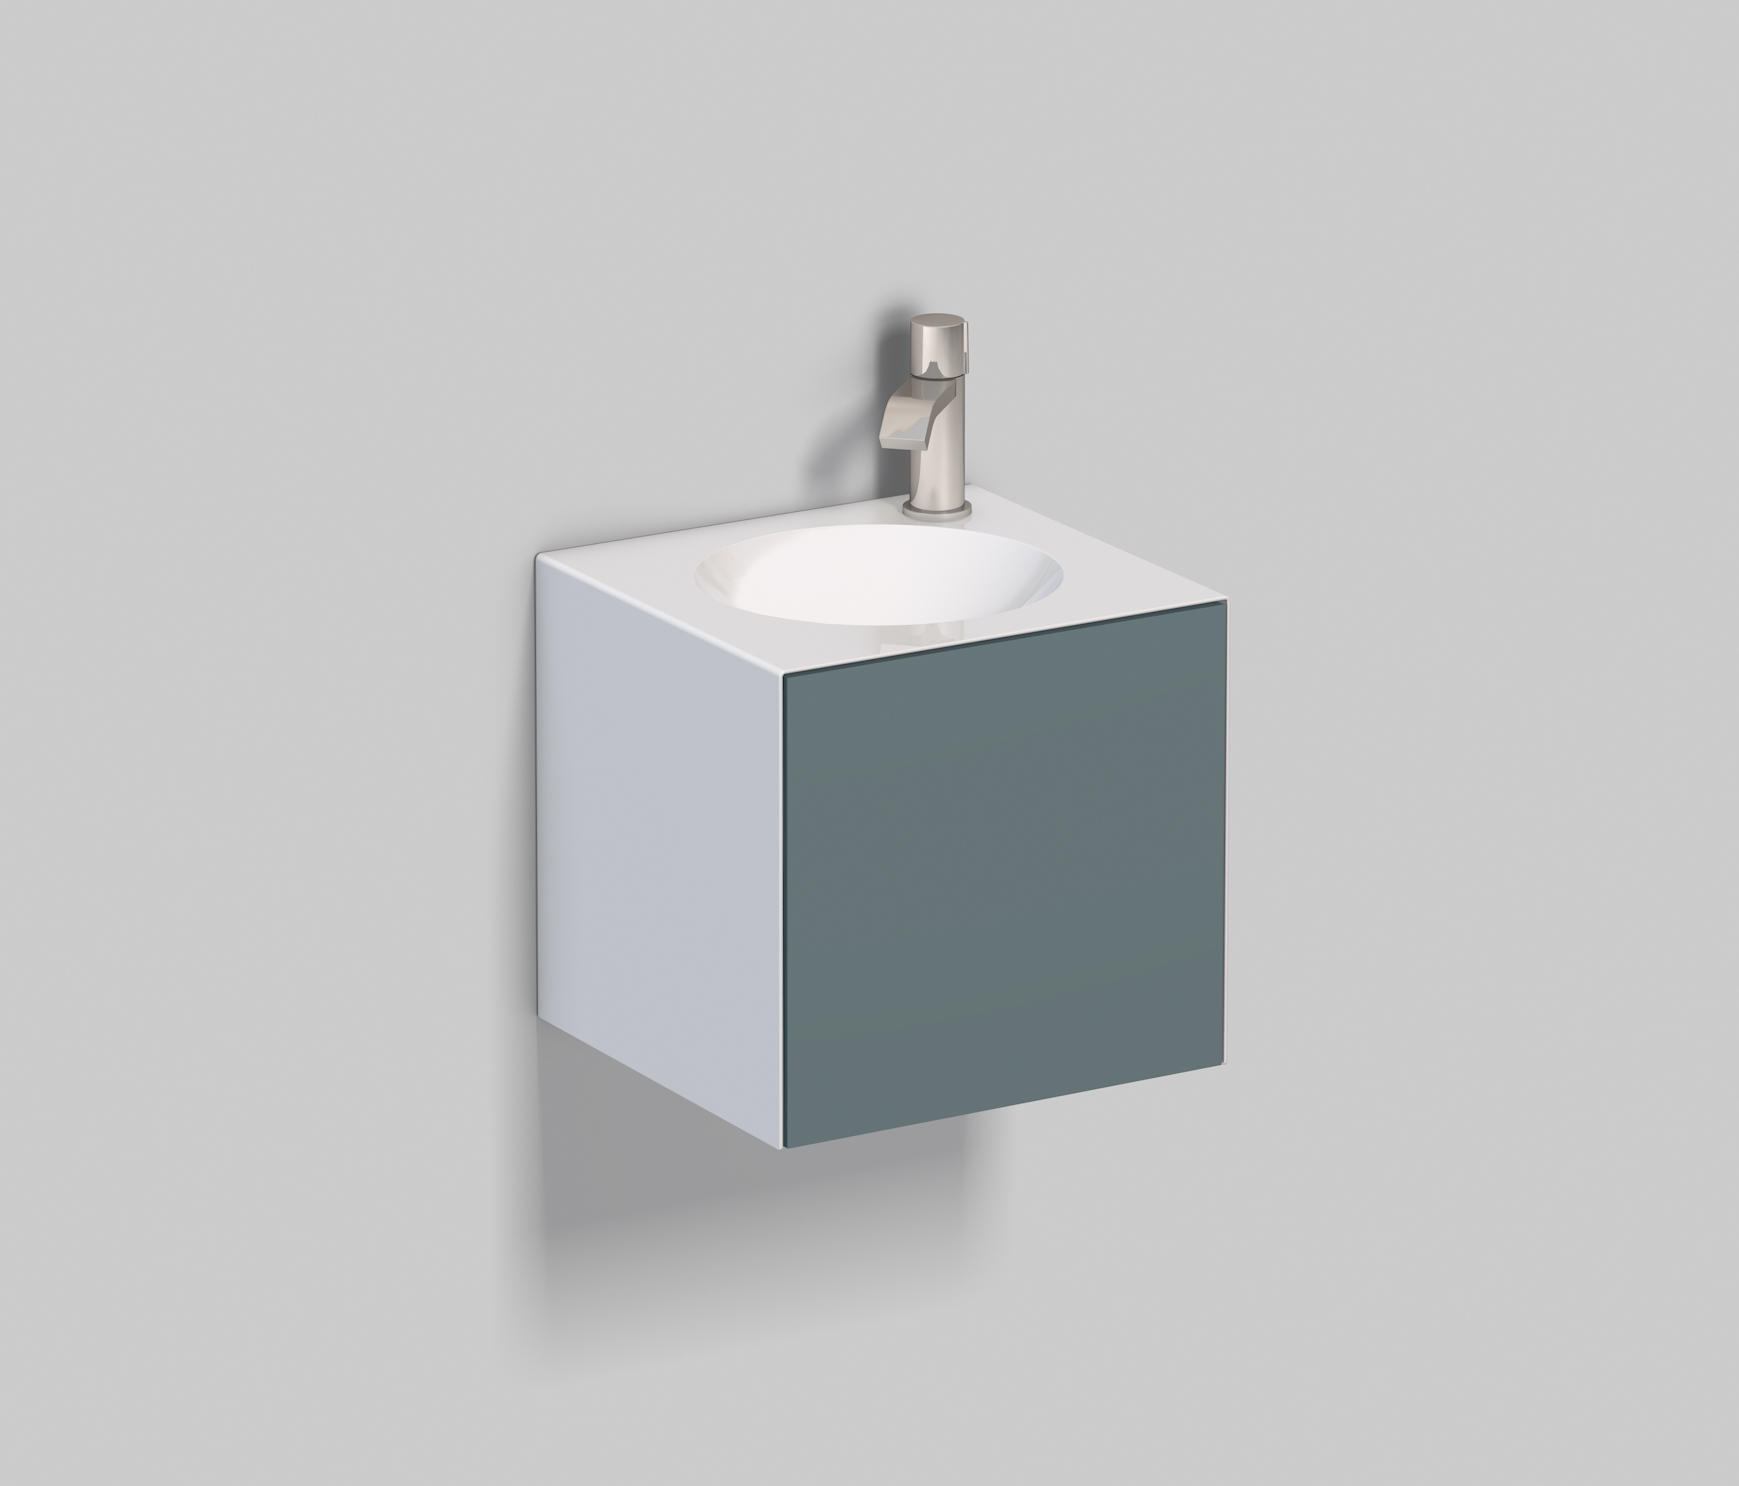 WP.FOLIO11 | GREY FOSSIL - Wash basins from Alape | Architonic